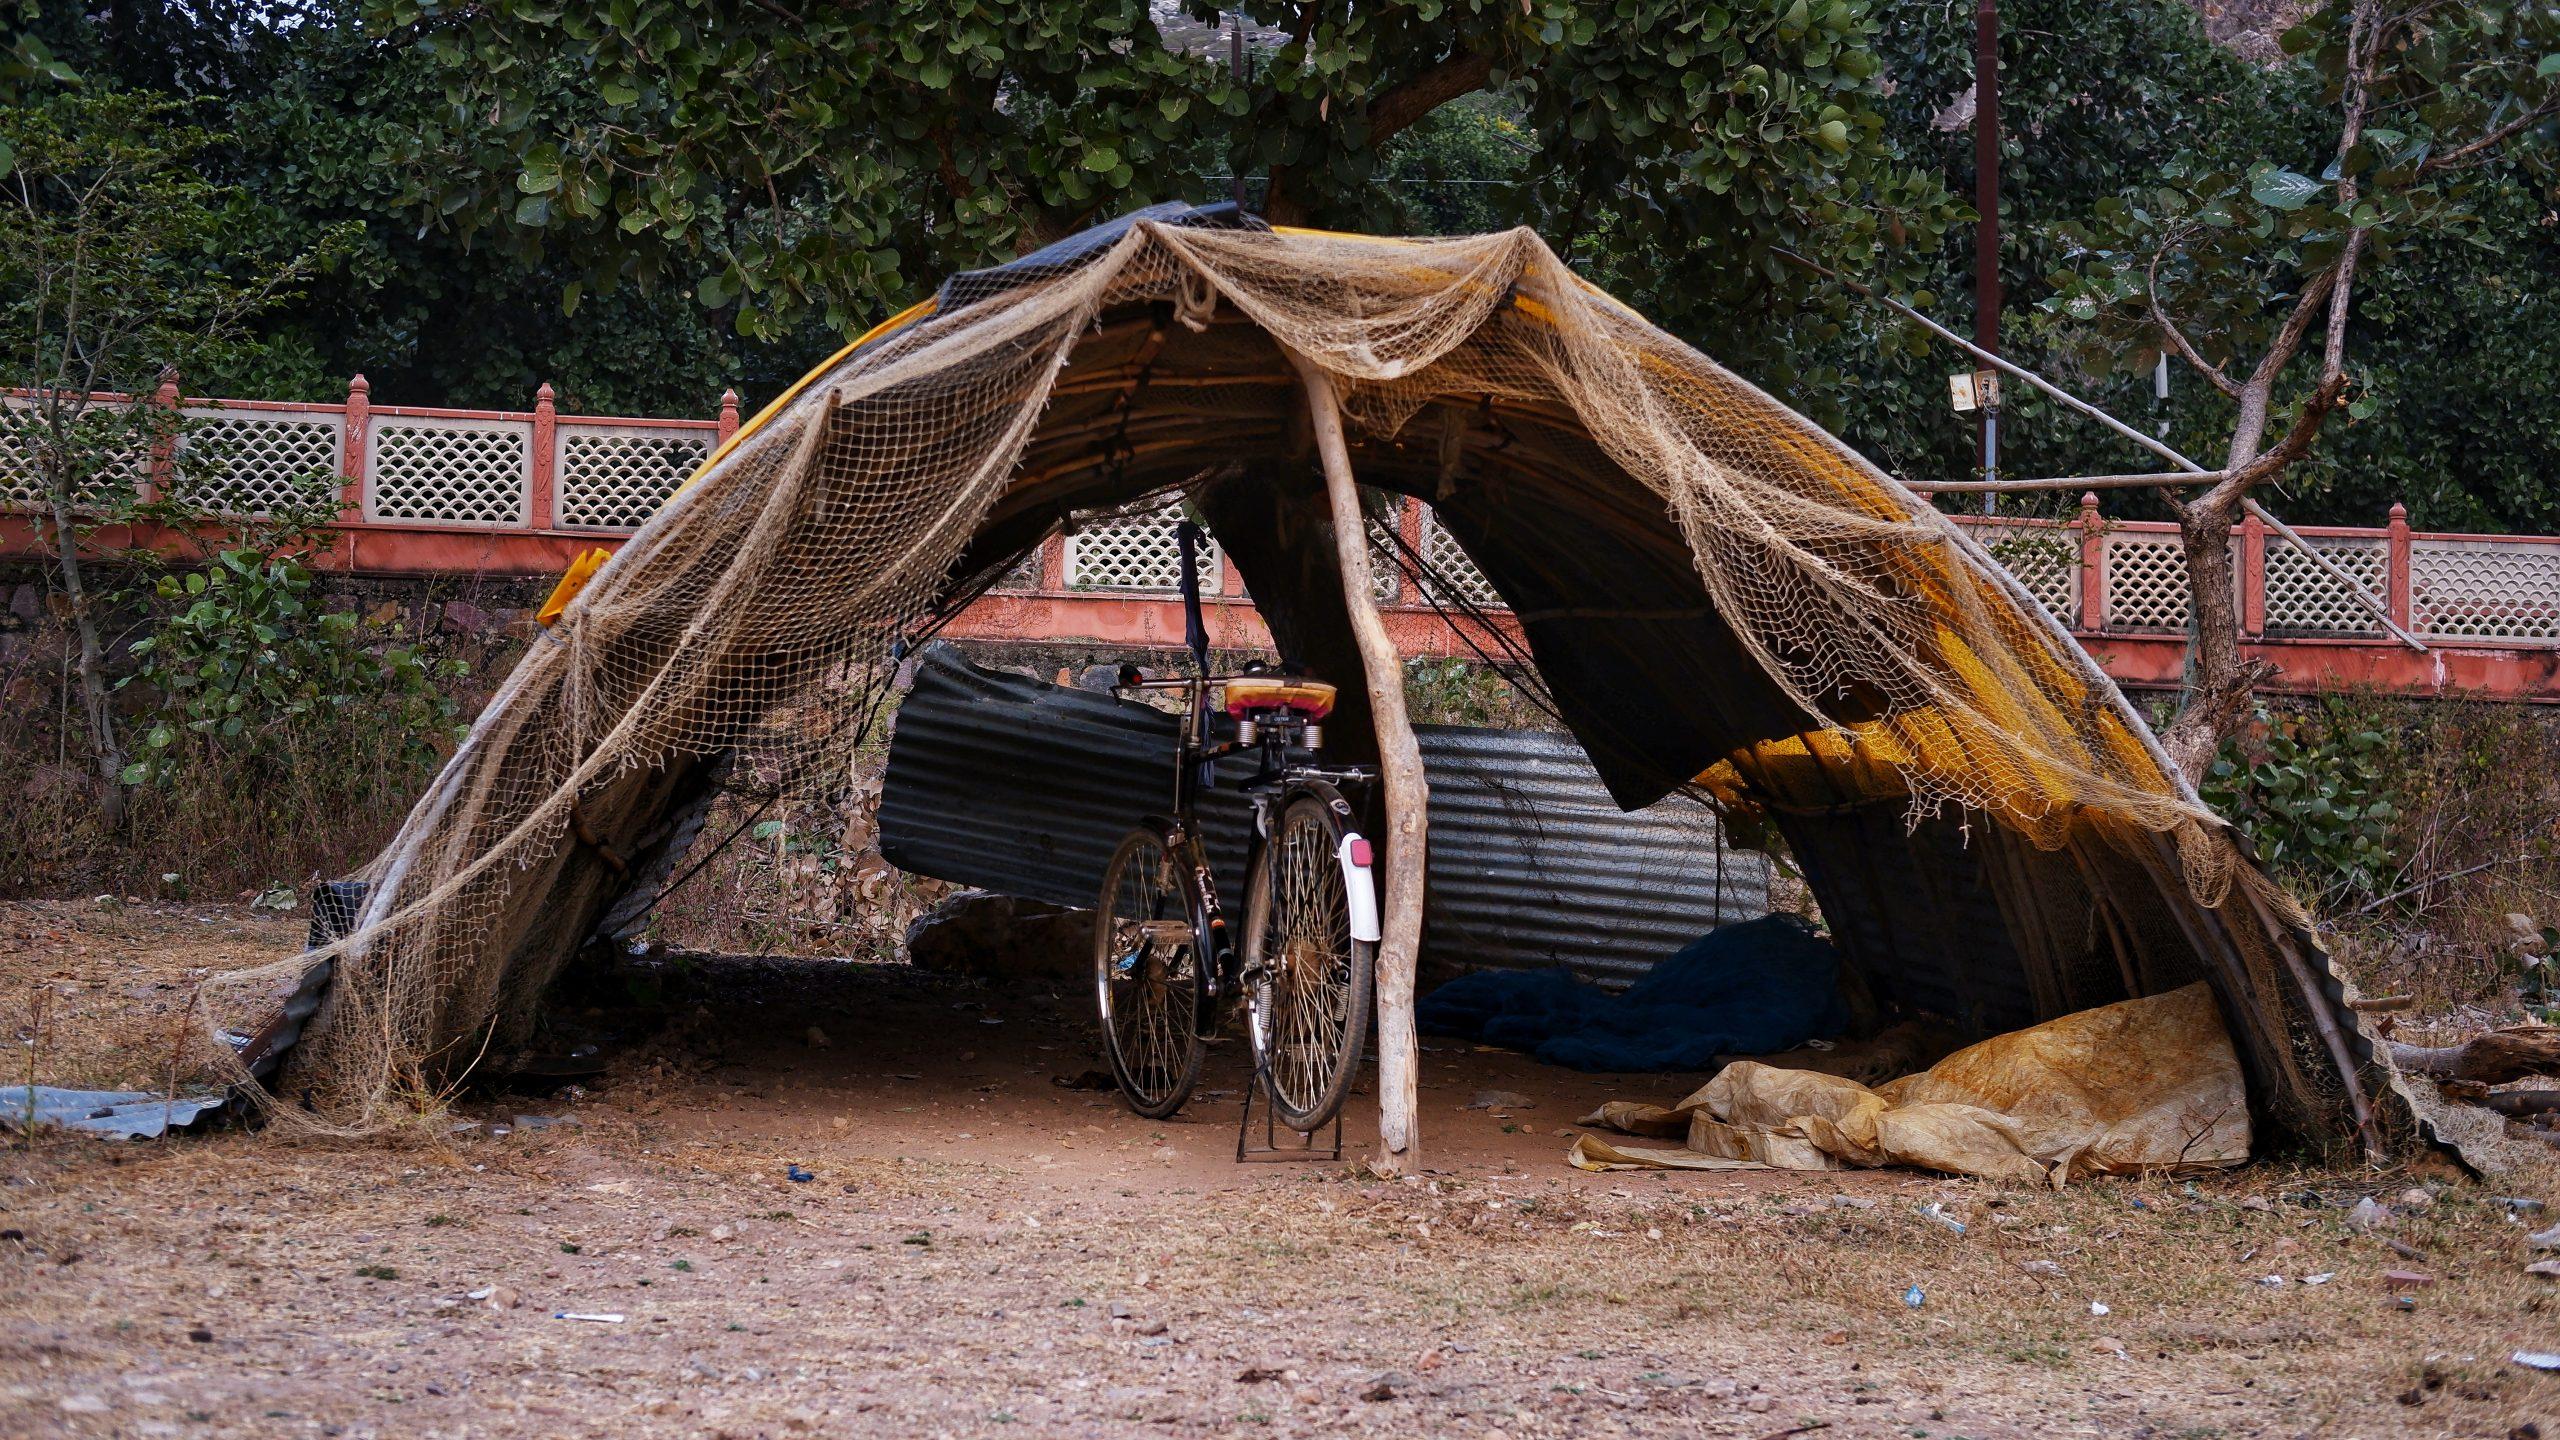 A temporary shelter